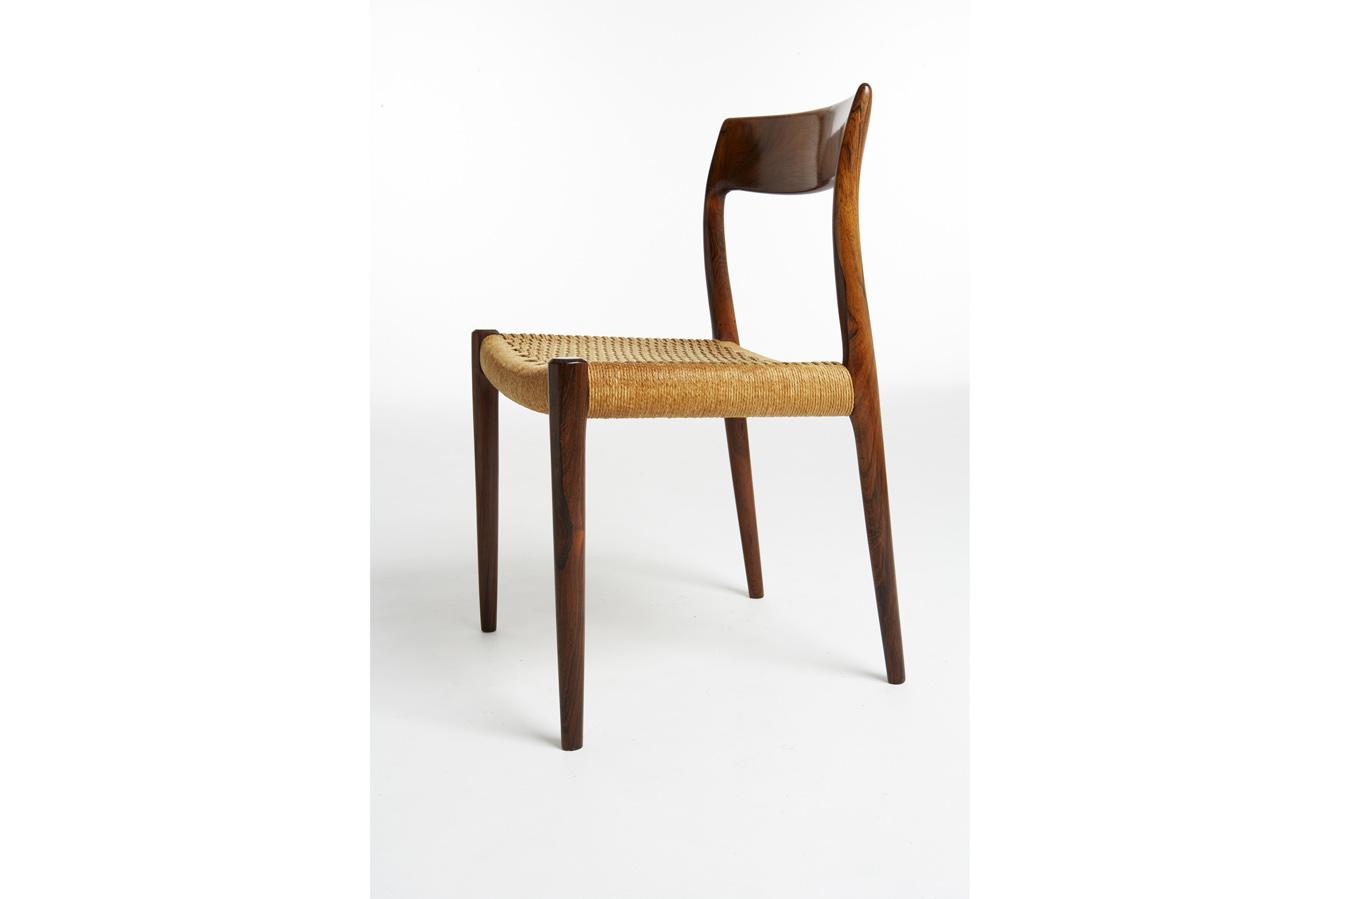 NOM58S-1 Cord Seat made of impregnated wood fiber set of 4_resize_gallery_block.jpg